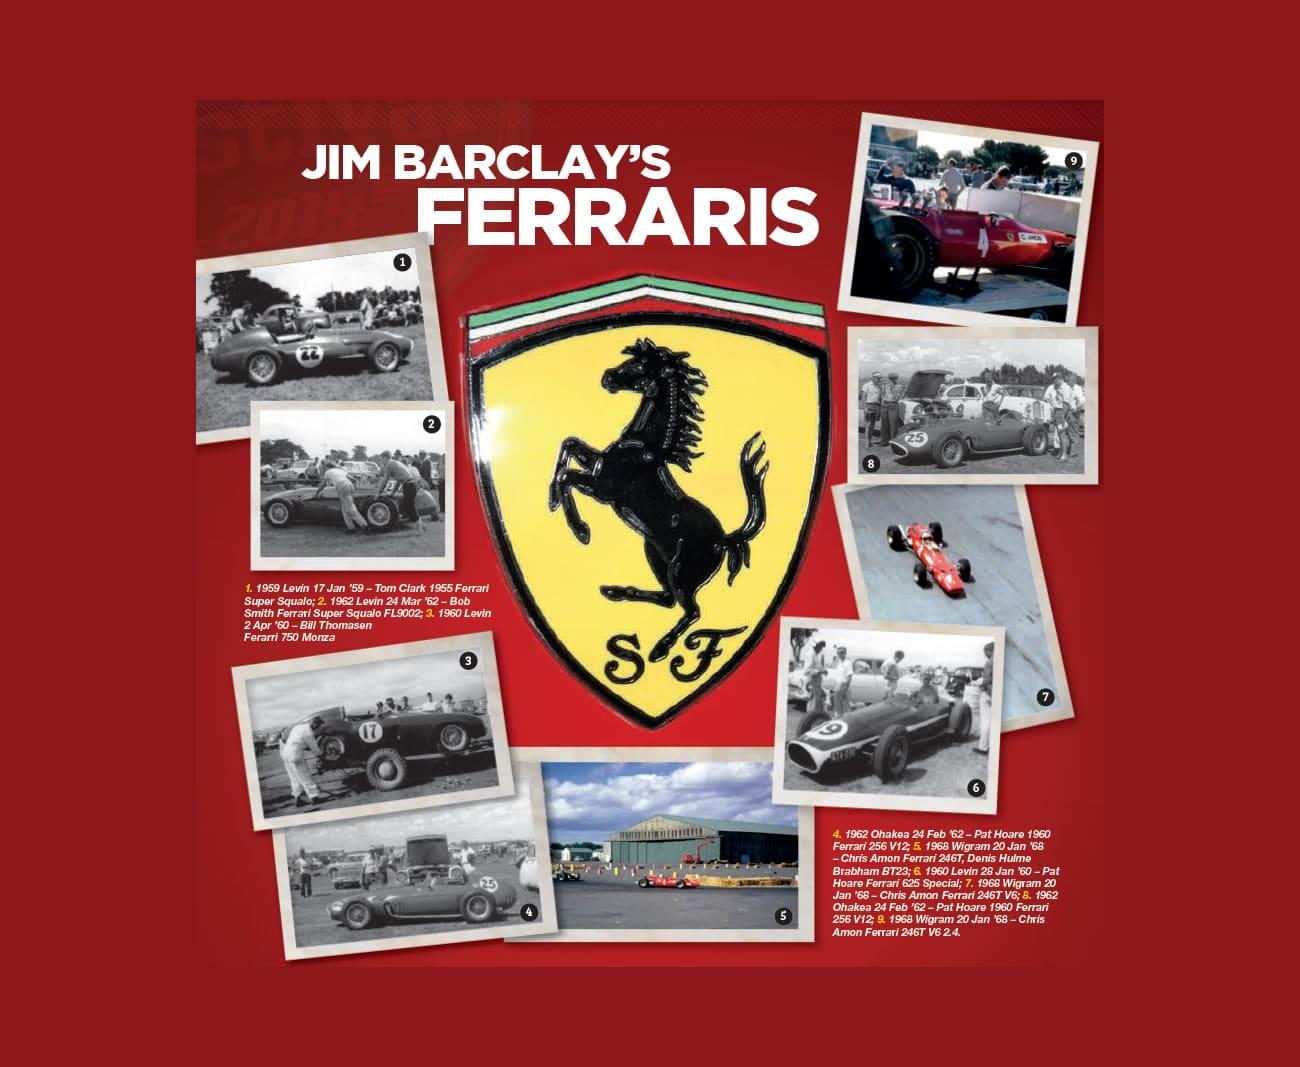 Ferrari Red NZFMR 2014, page 4